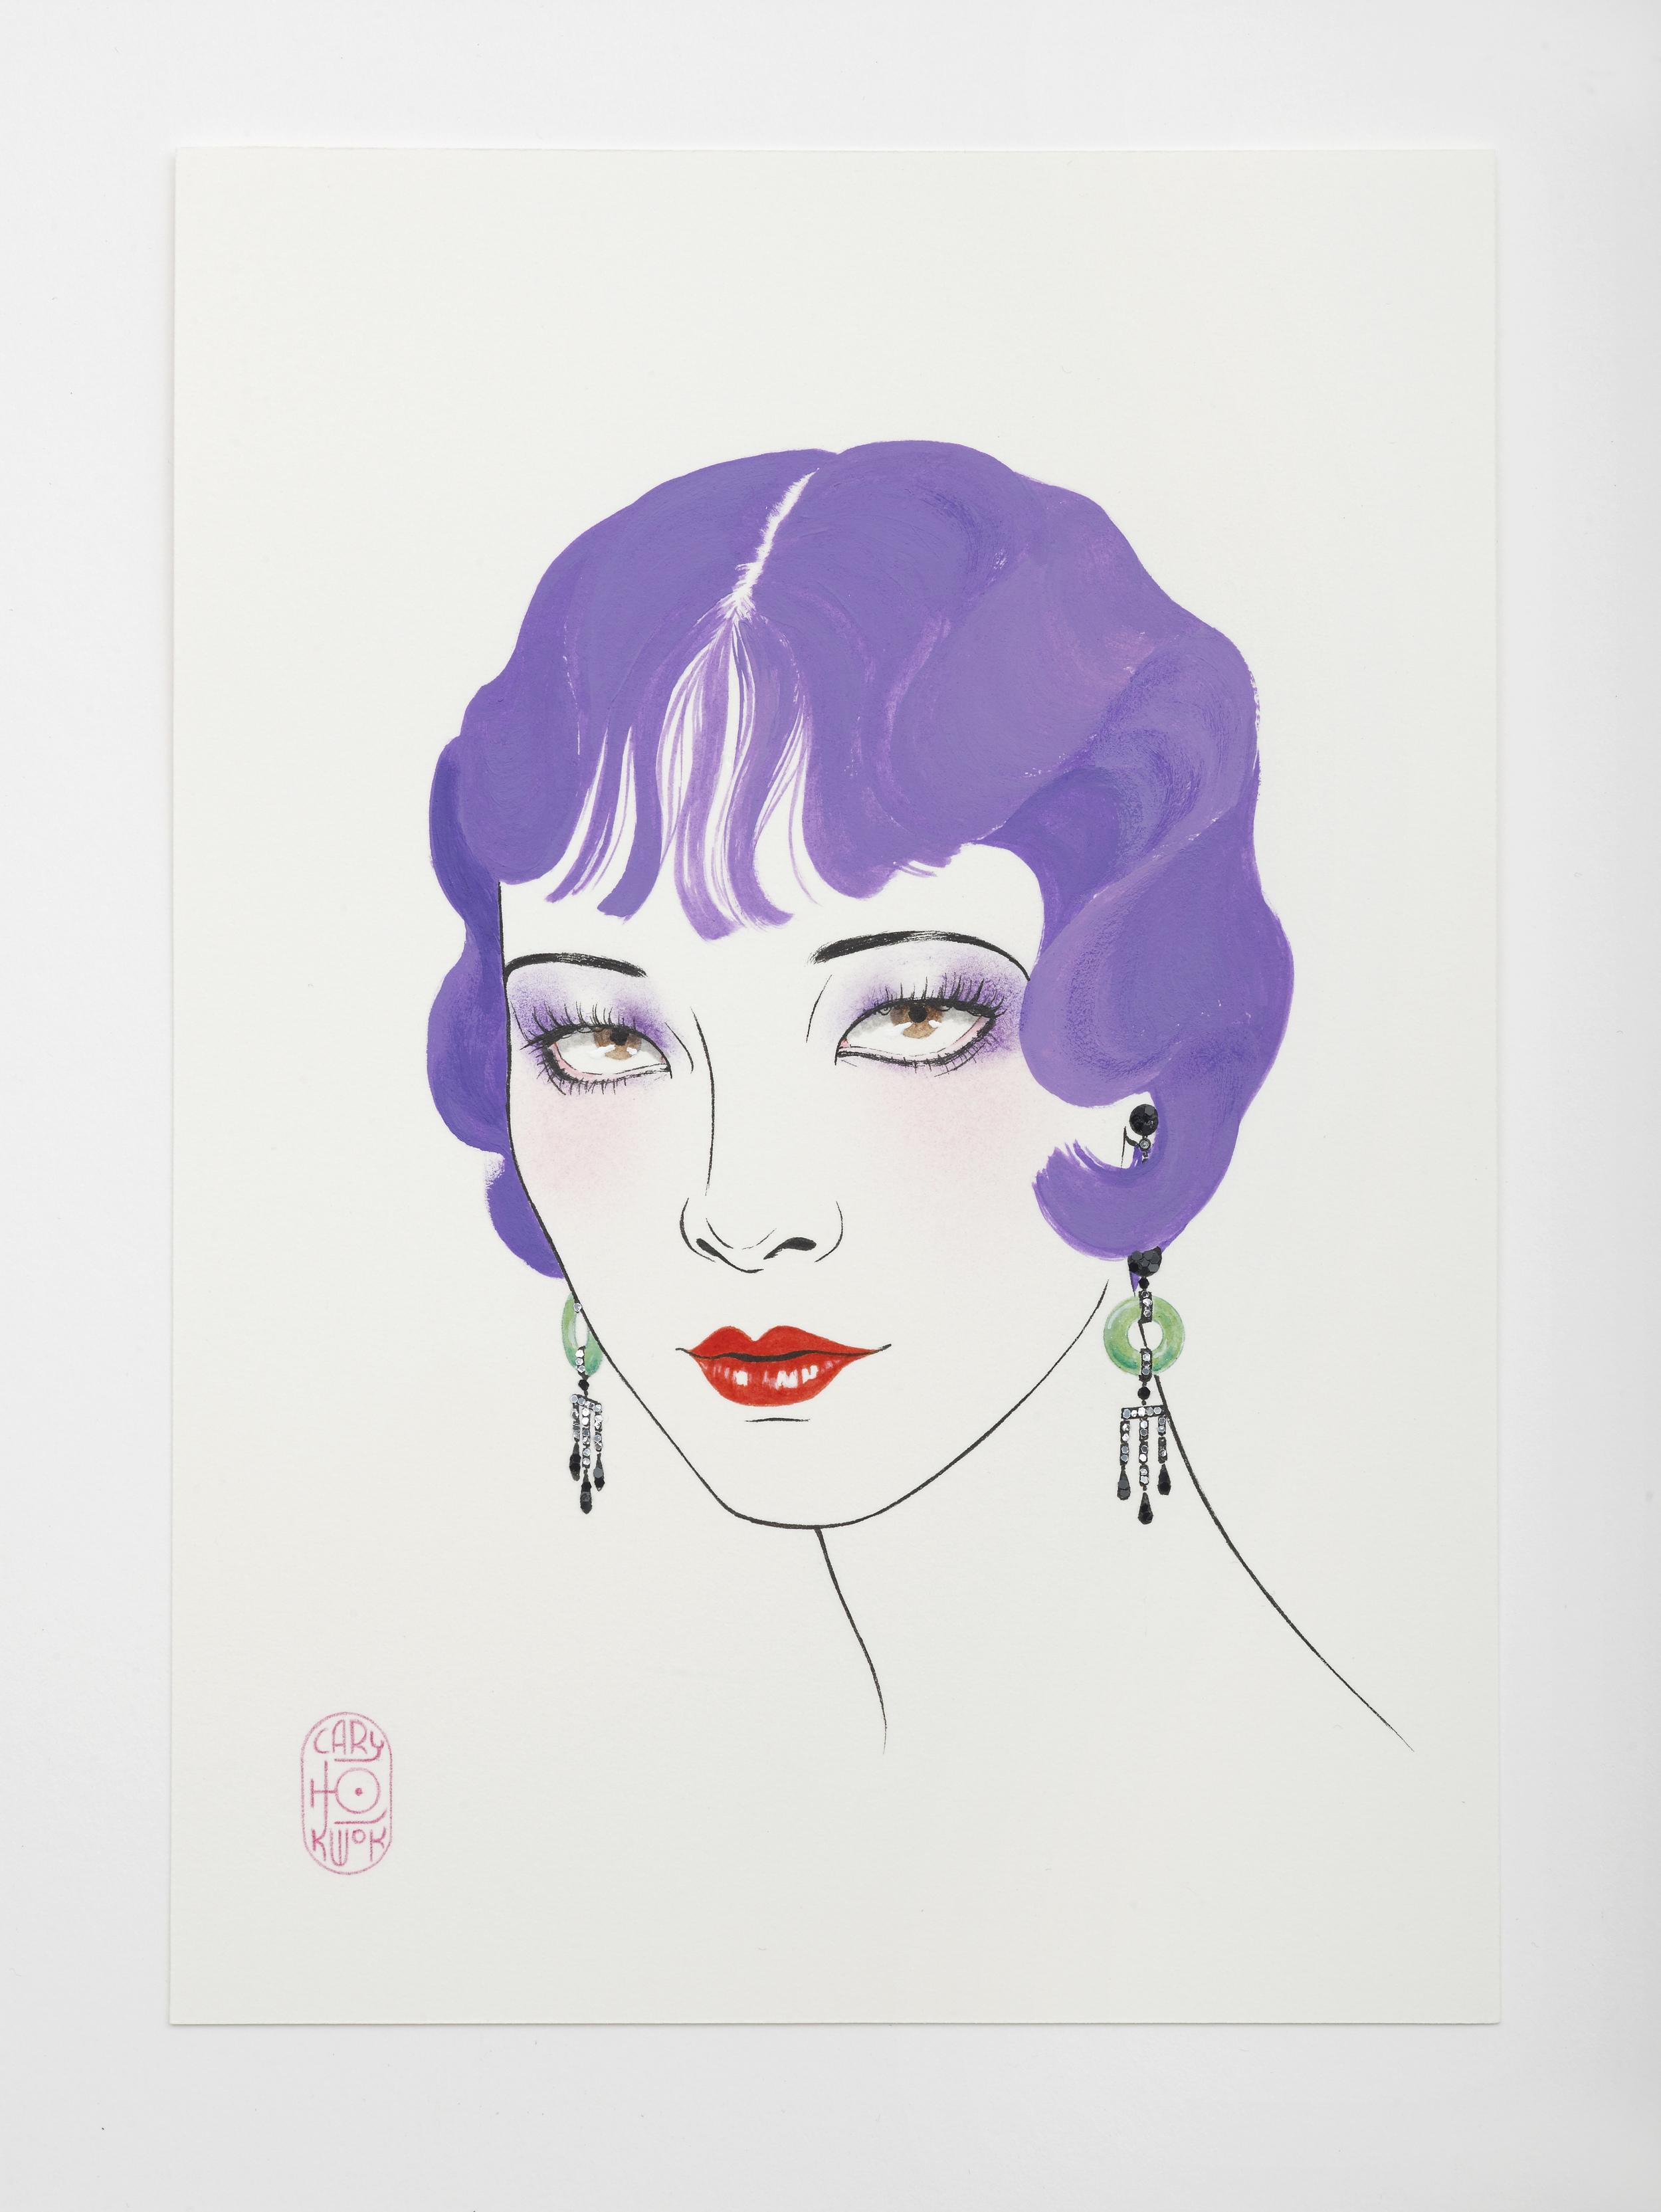 Plumage (Purple - 1920s) 2016 Ink, acrylic, glitter 21 x 14.8 cm / 8.2 x 5.8 in